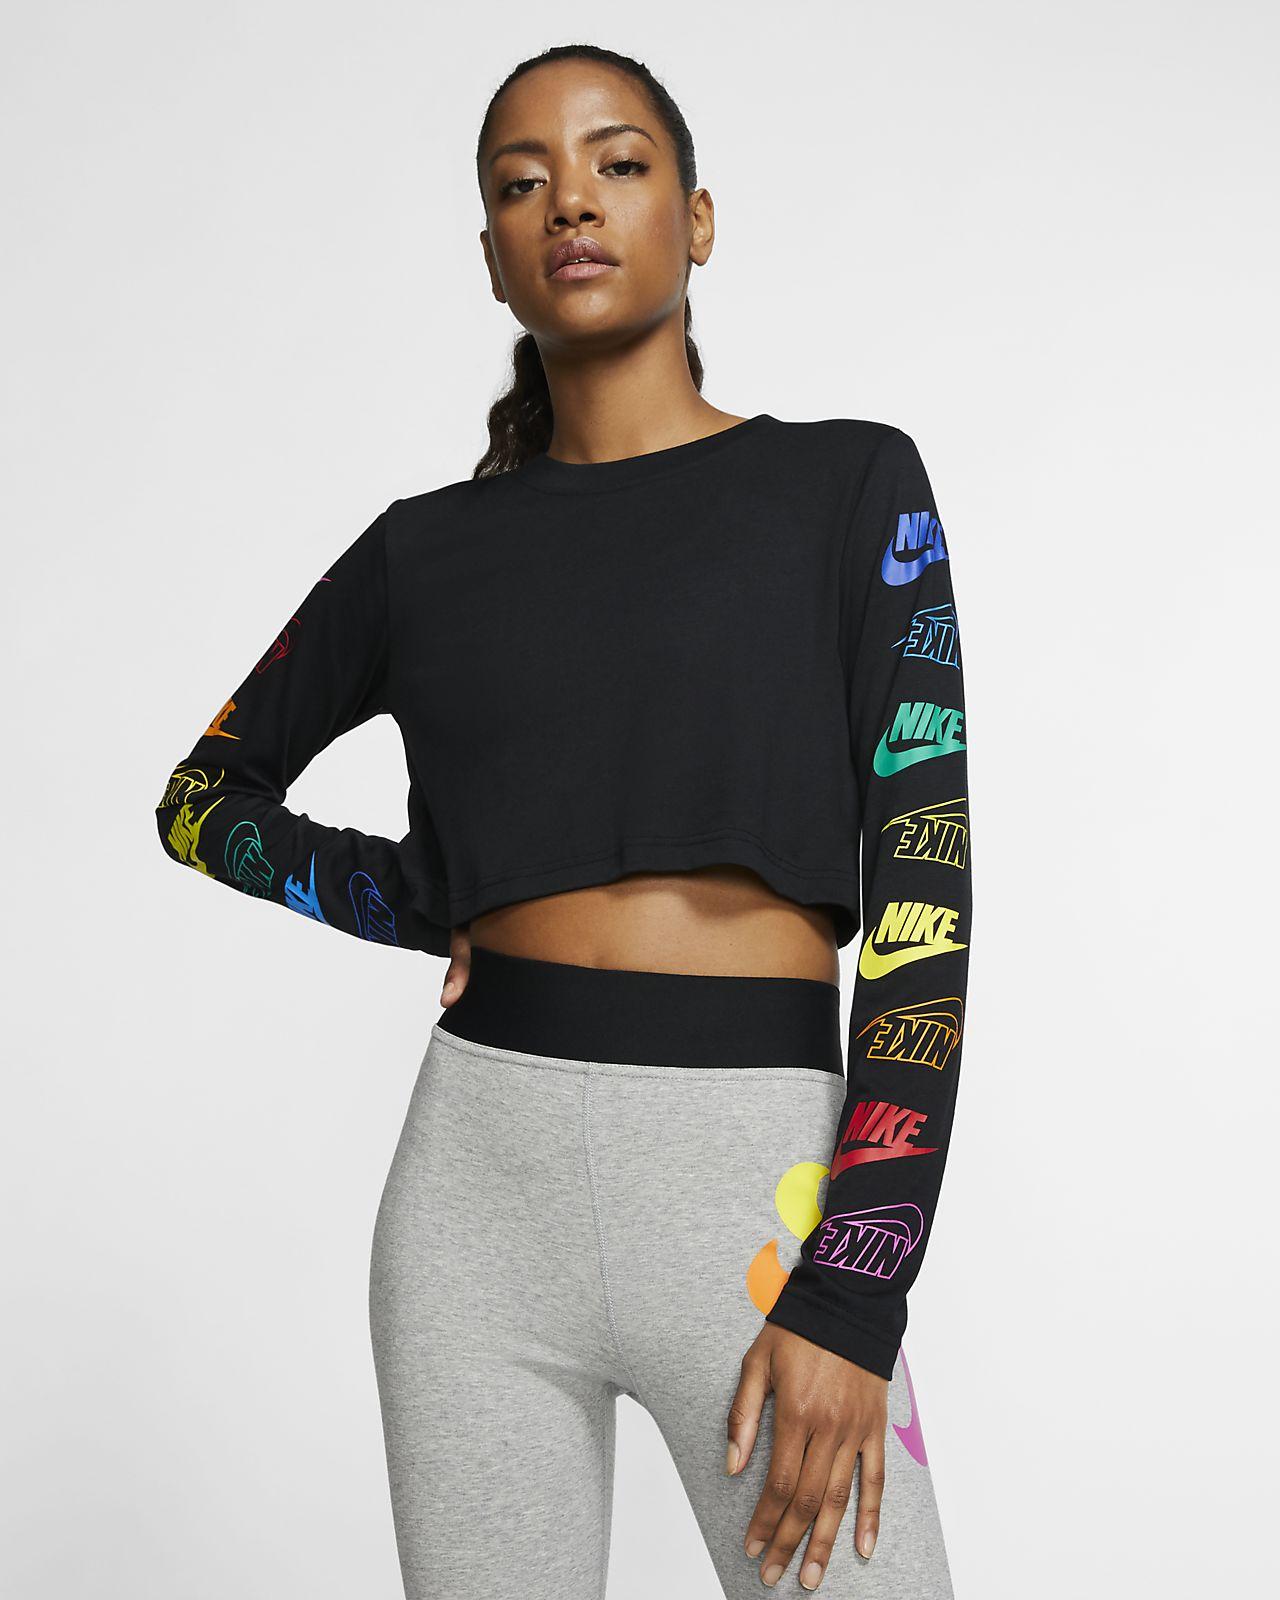 5c0adbf9fef39 Nike Sportswear Women's Long-Sleeve T-Shirt. Nike.com CH